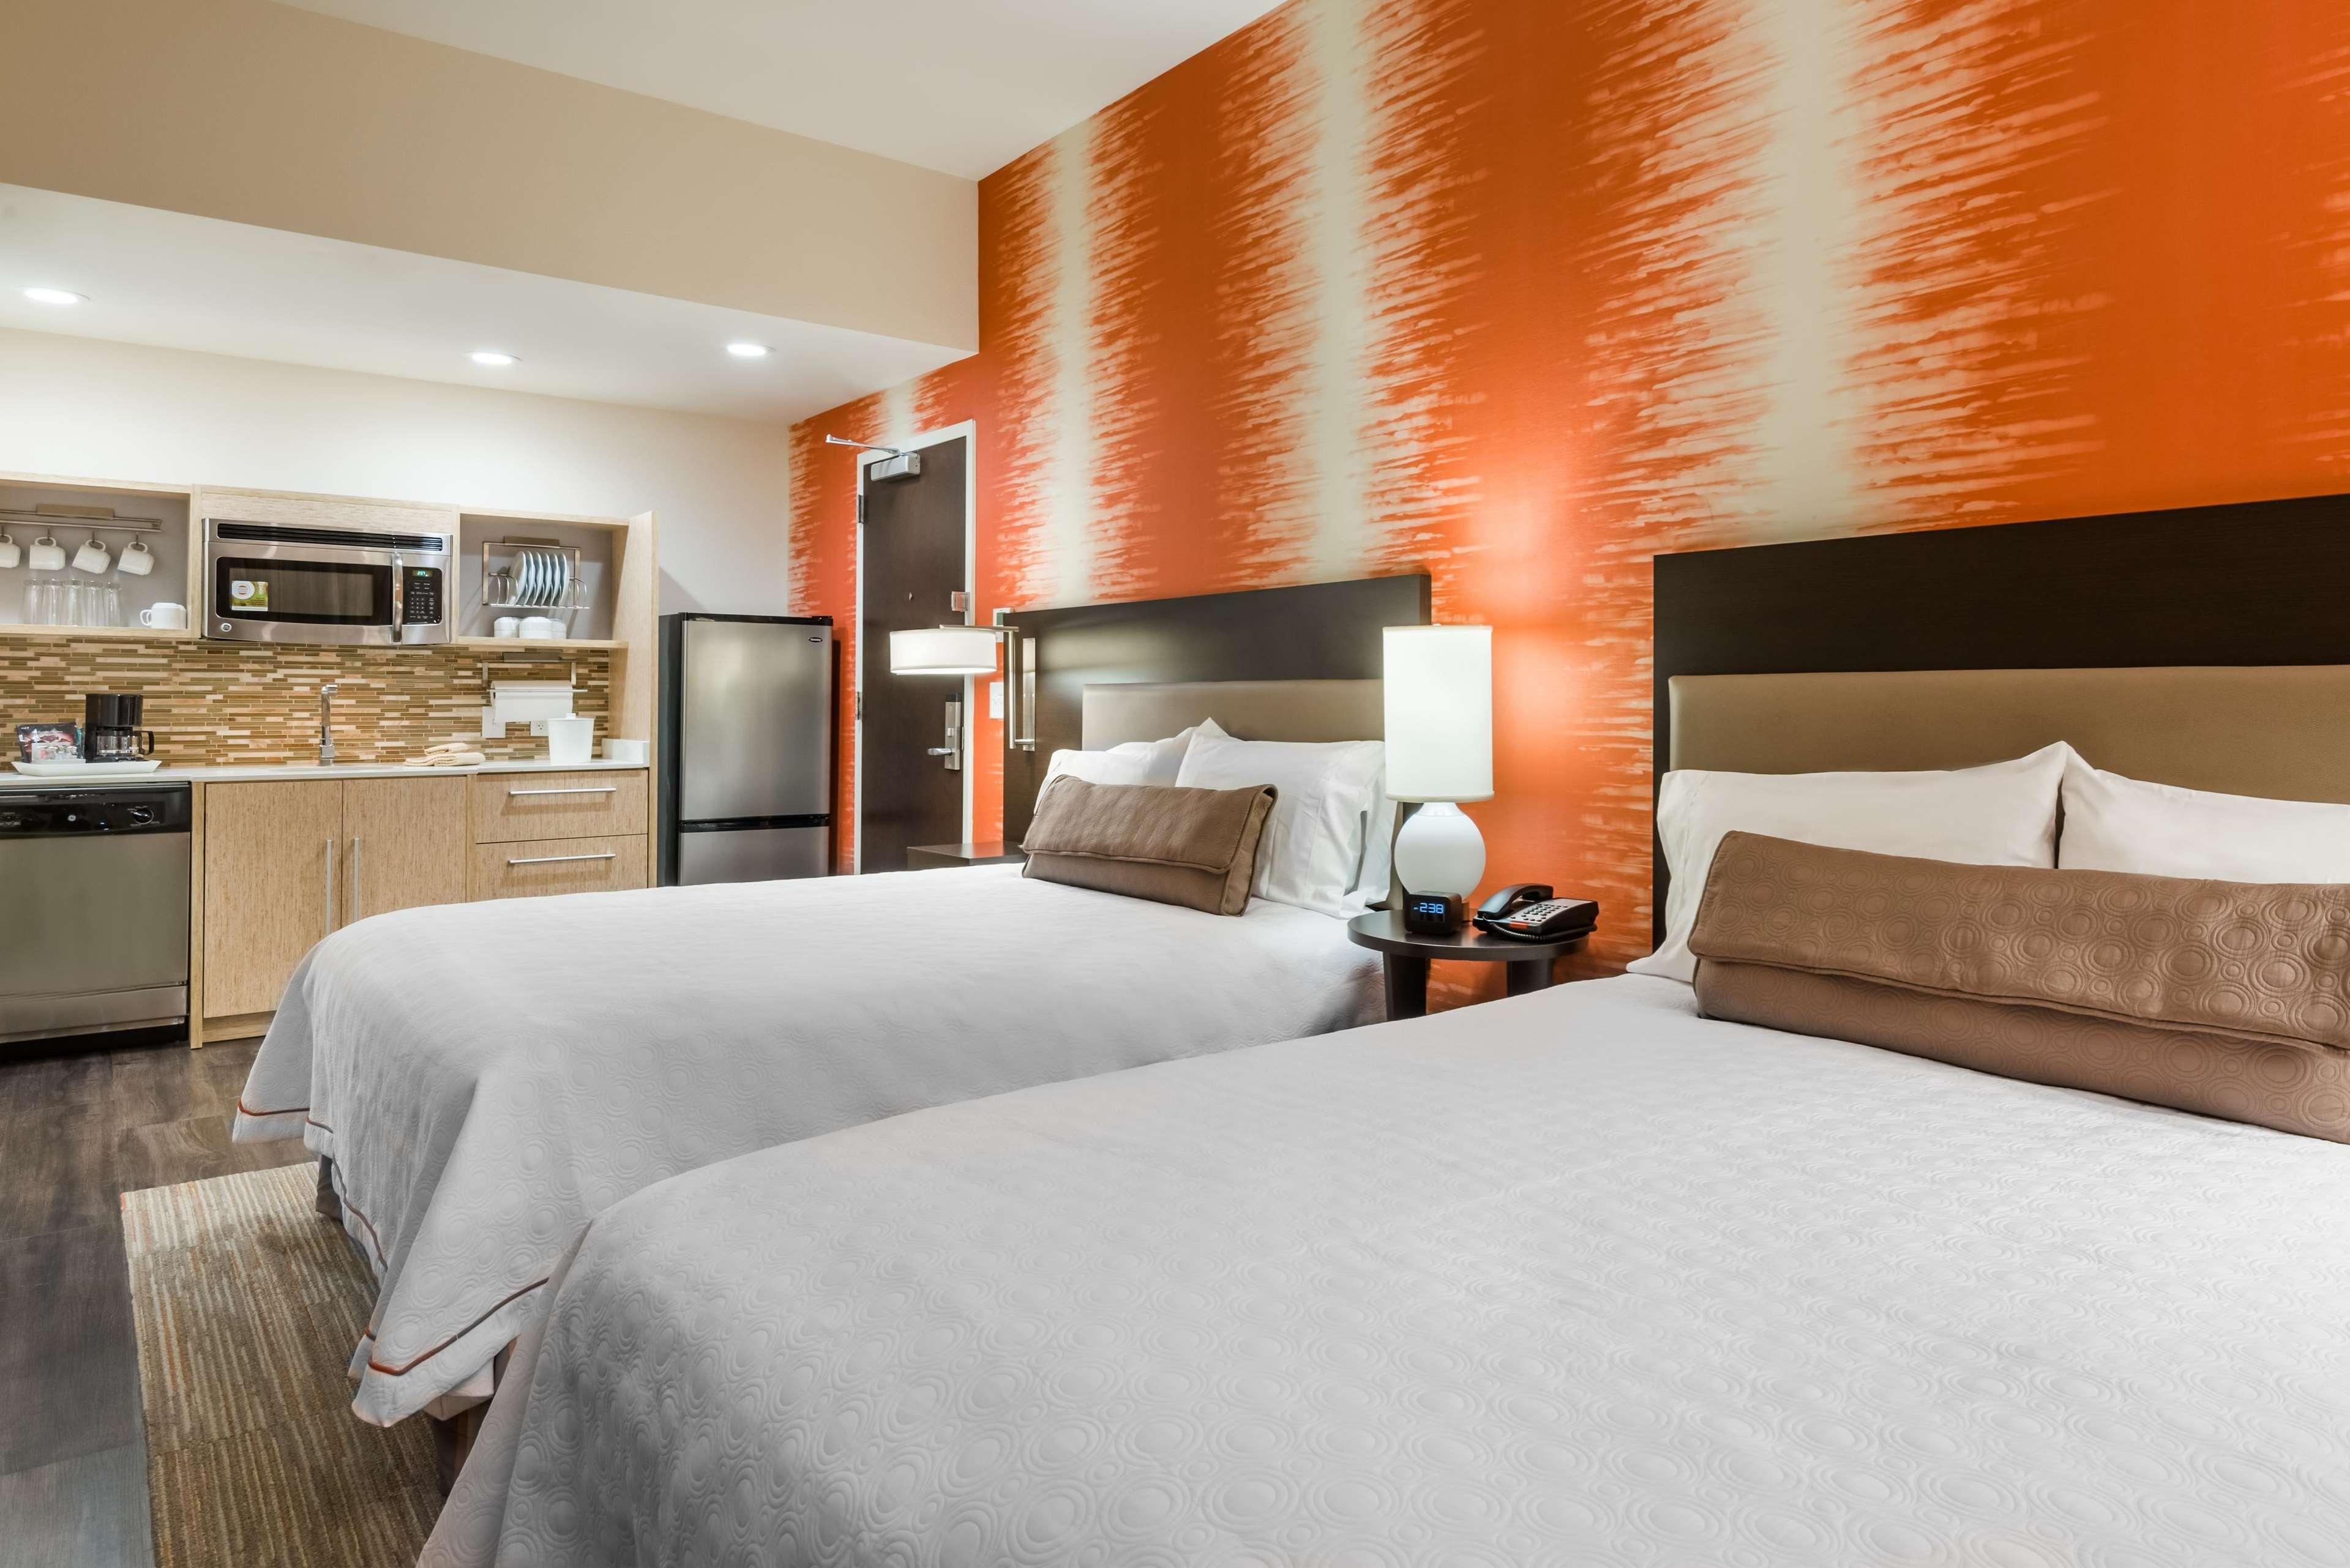 Home2 Suites by Hilton Atlanta Downtown image 3